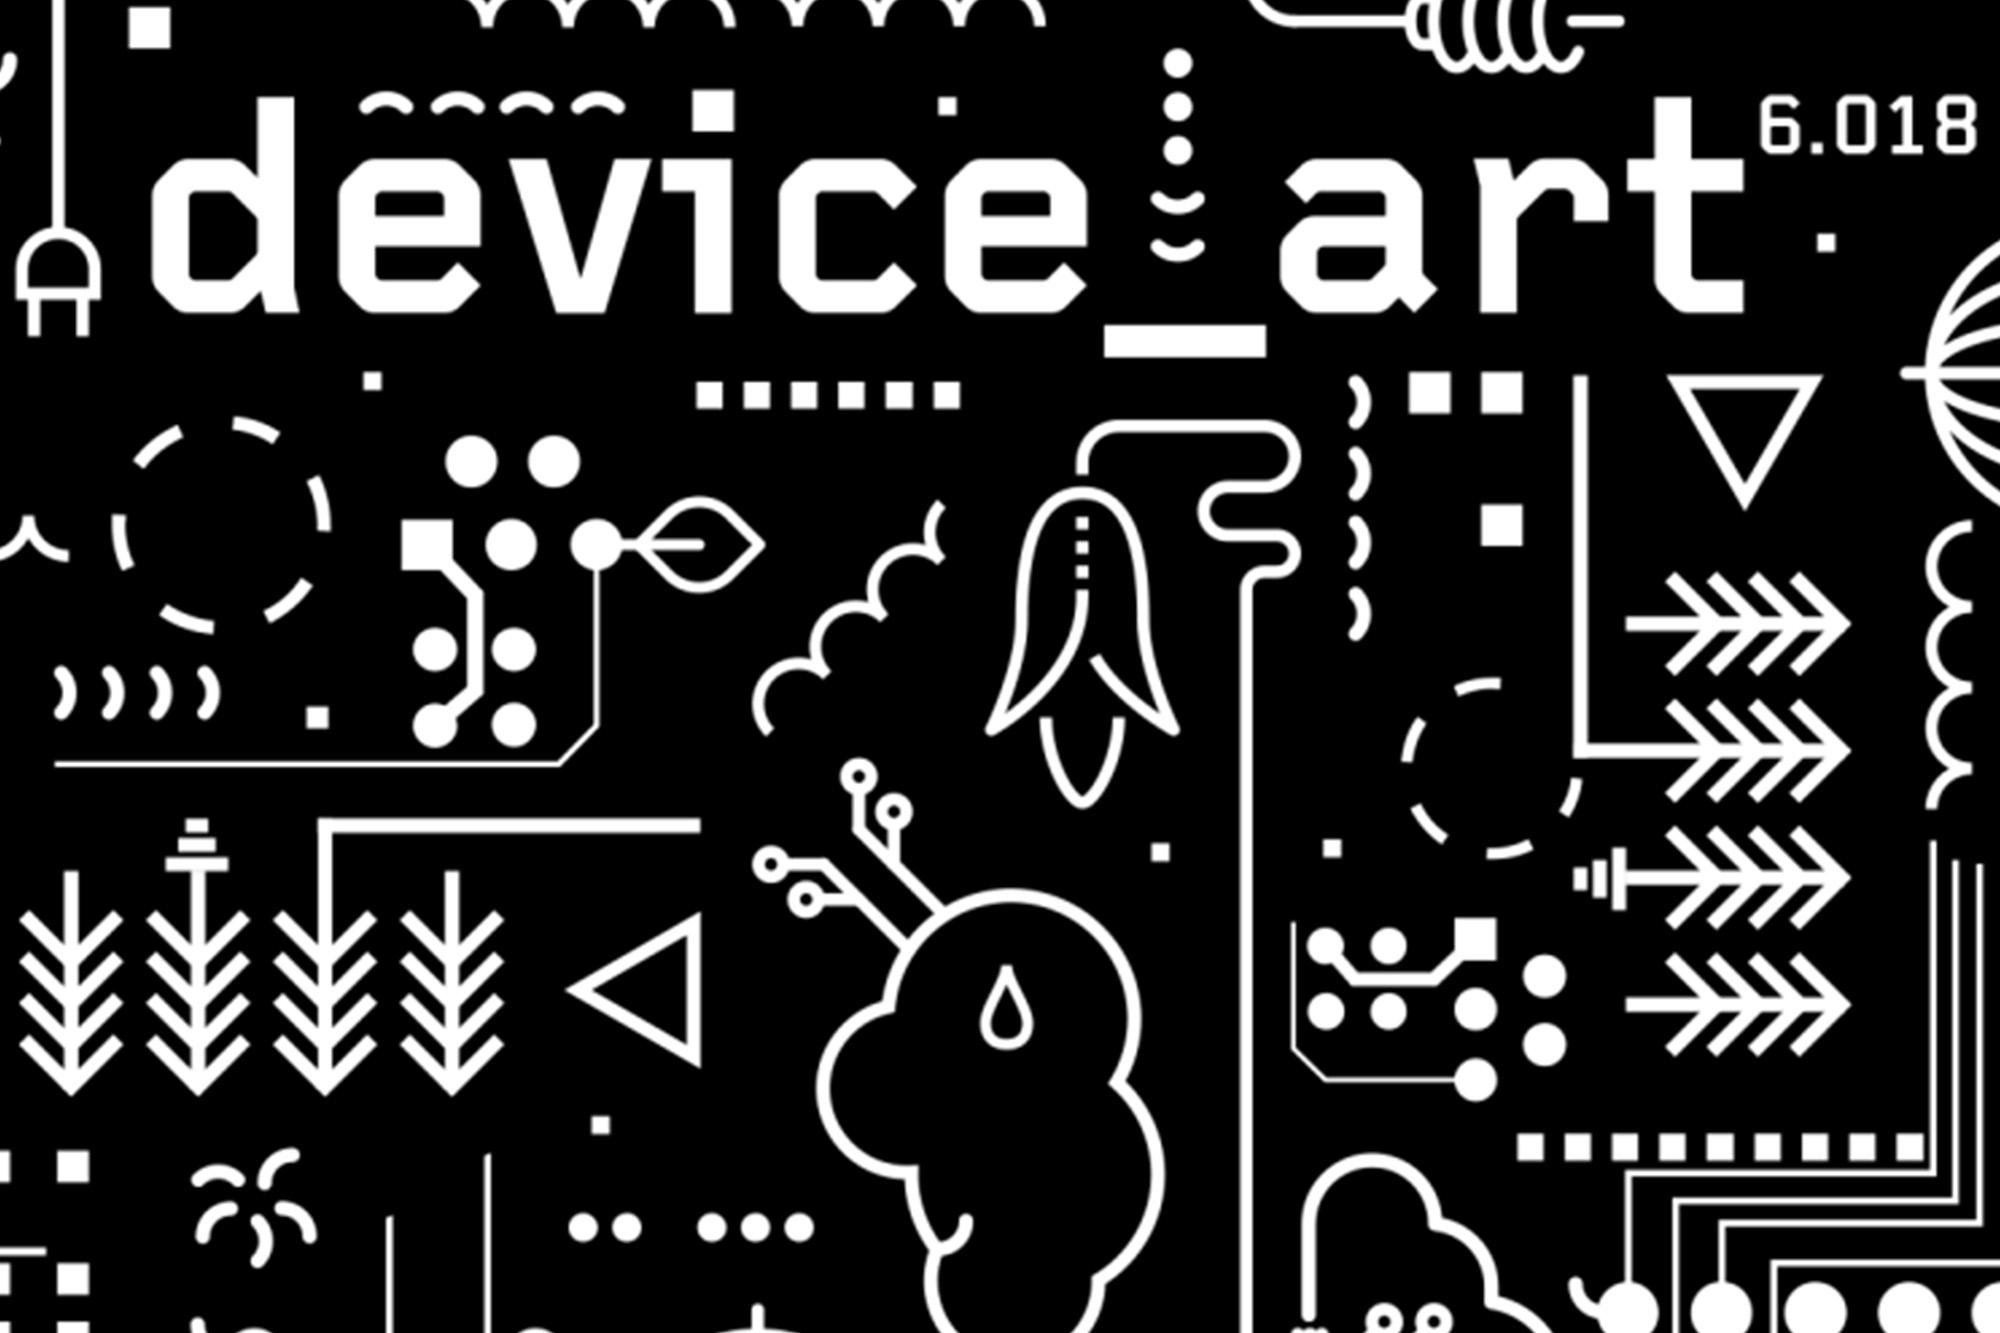 device_art4